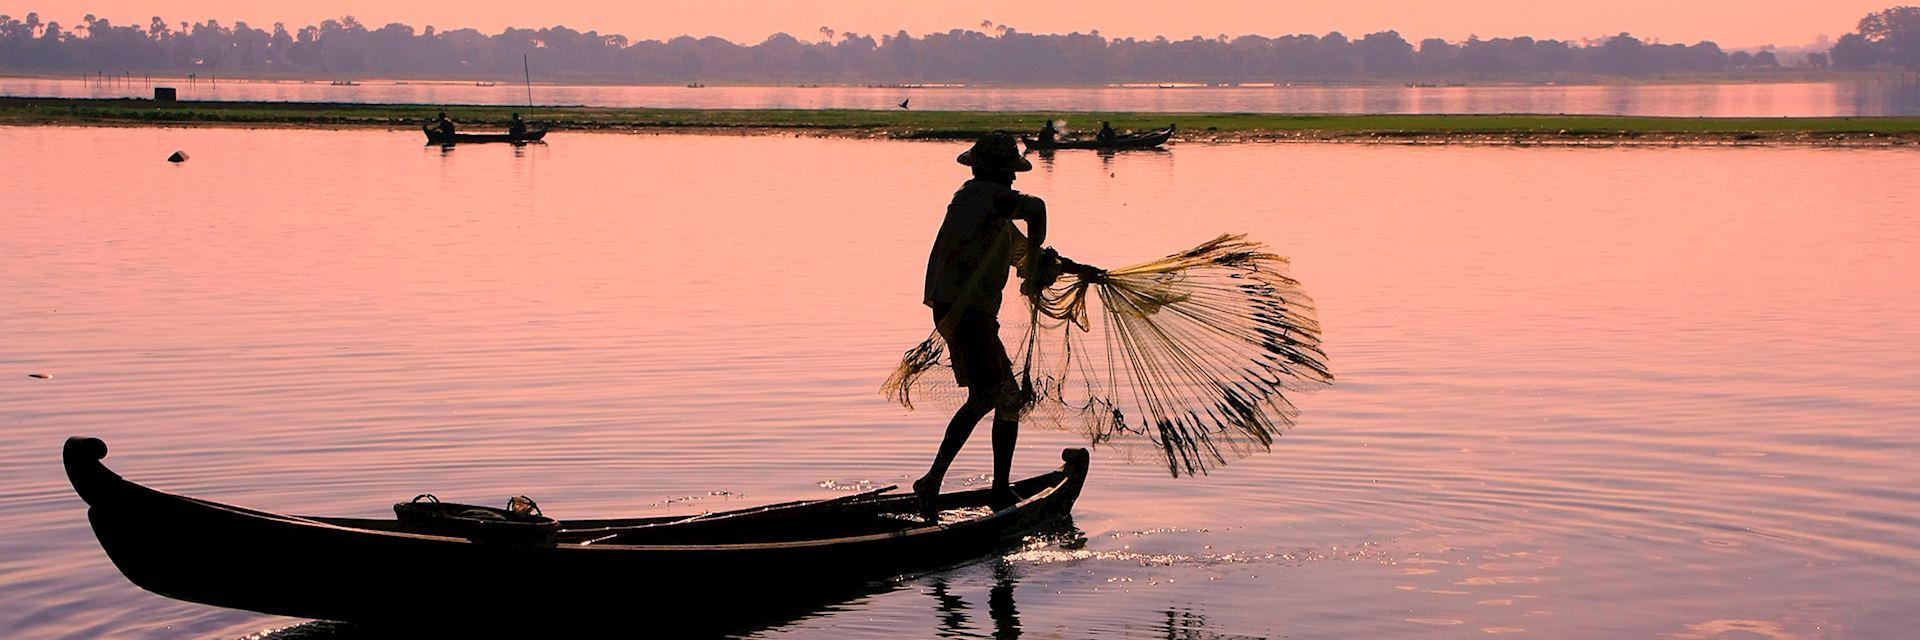 Ayeyarwady River, Myanmar (Burma)